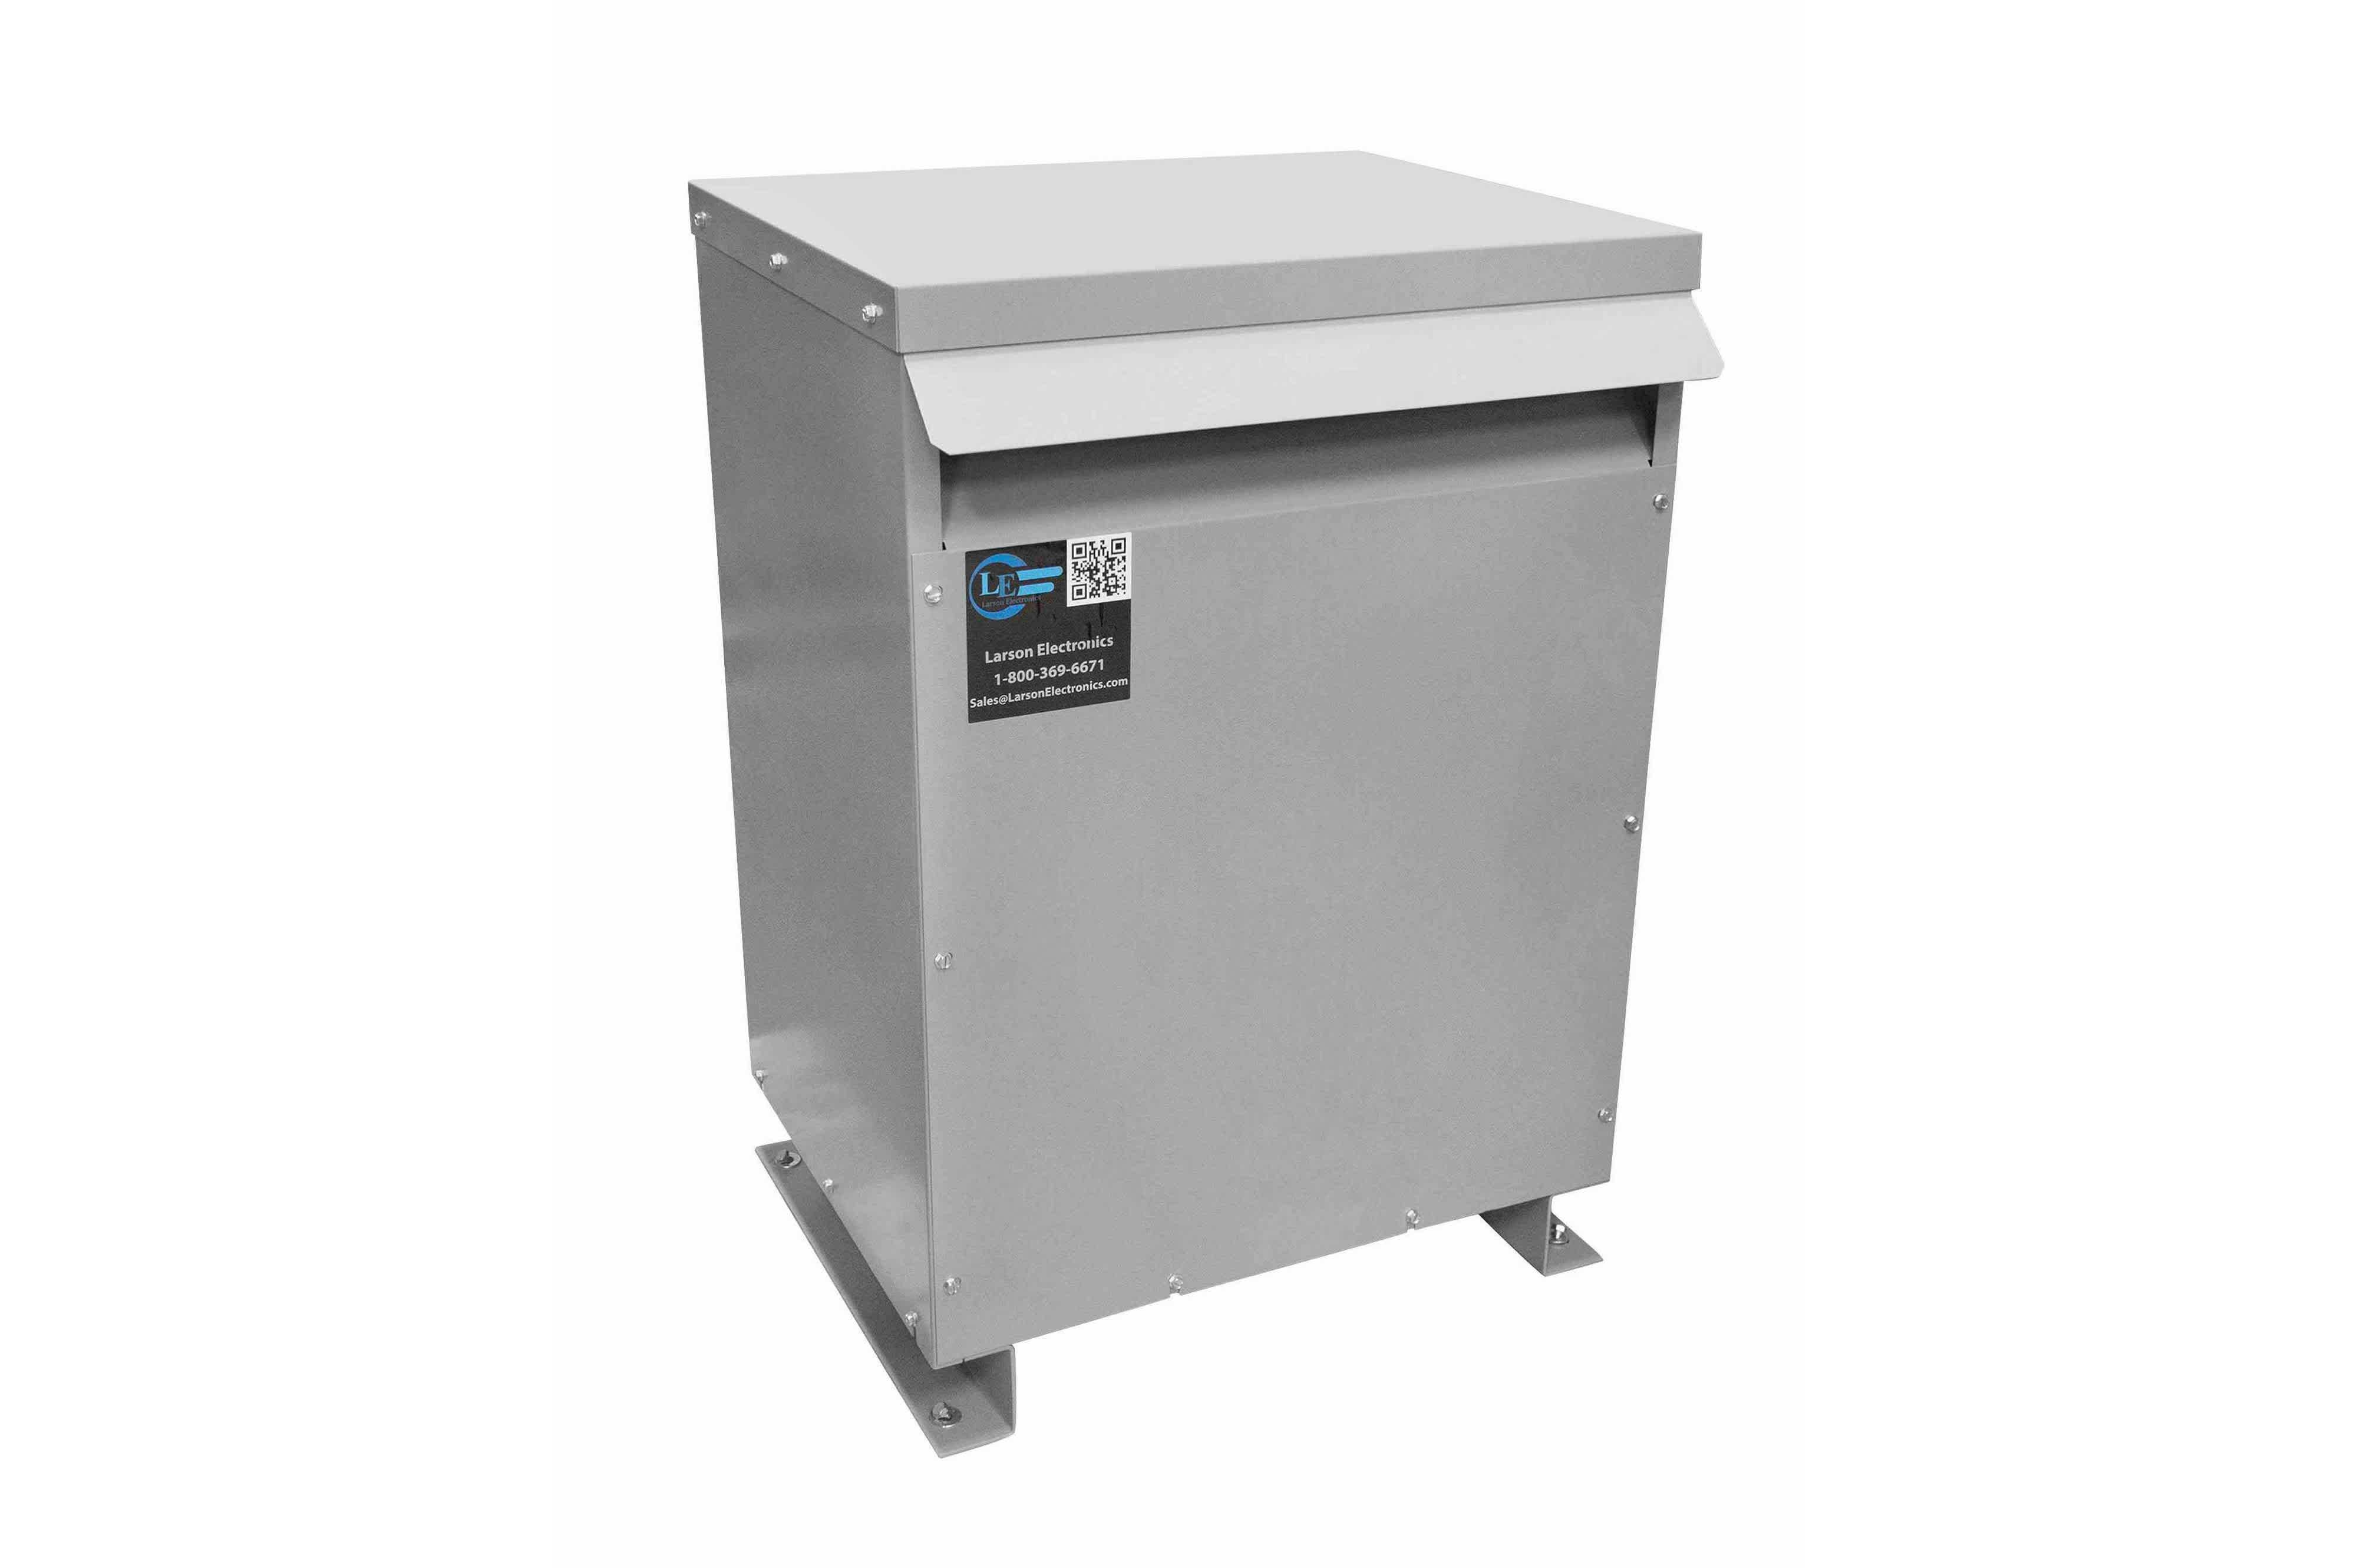 900 kVA 3PH Isolation Transformer, 575V Wye Primary, 415Y/240 Wye-N Secondary, N3R, Ventilated, 60 Hz